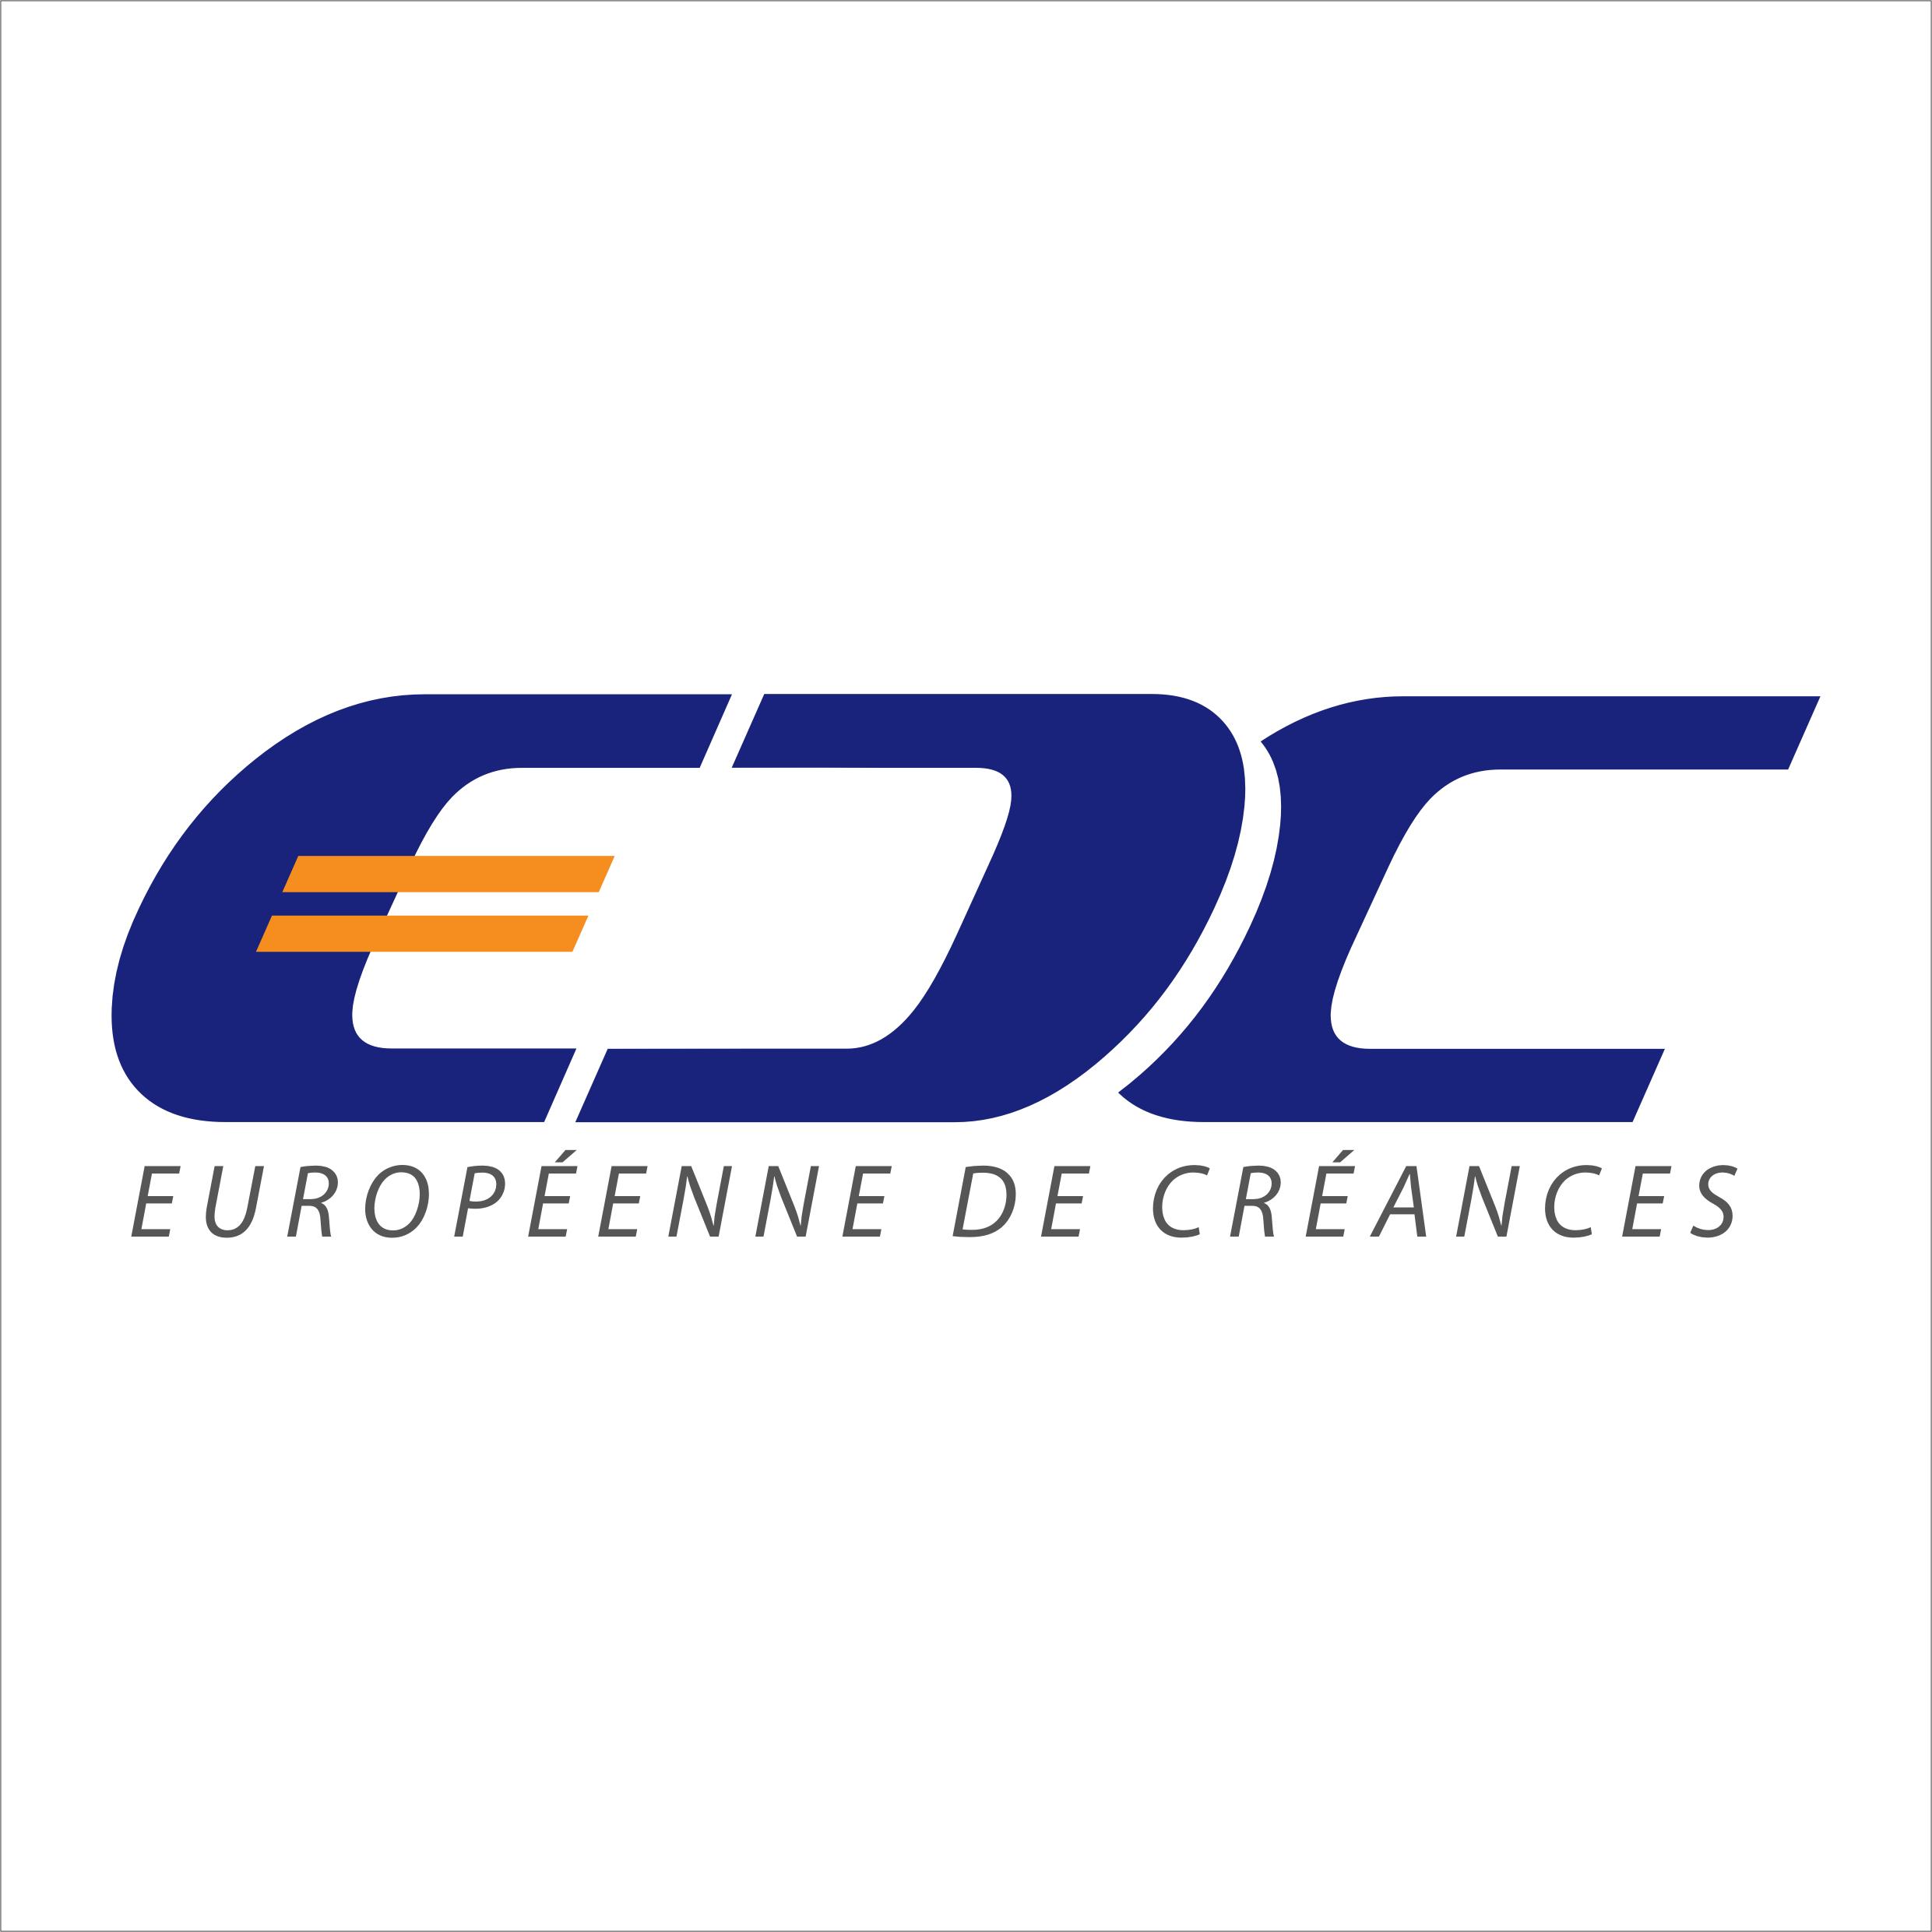 EUROPEENNE DE CREANCES